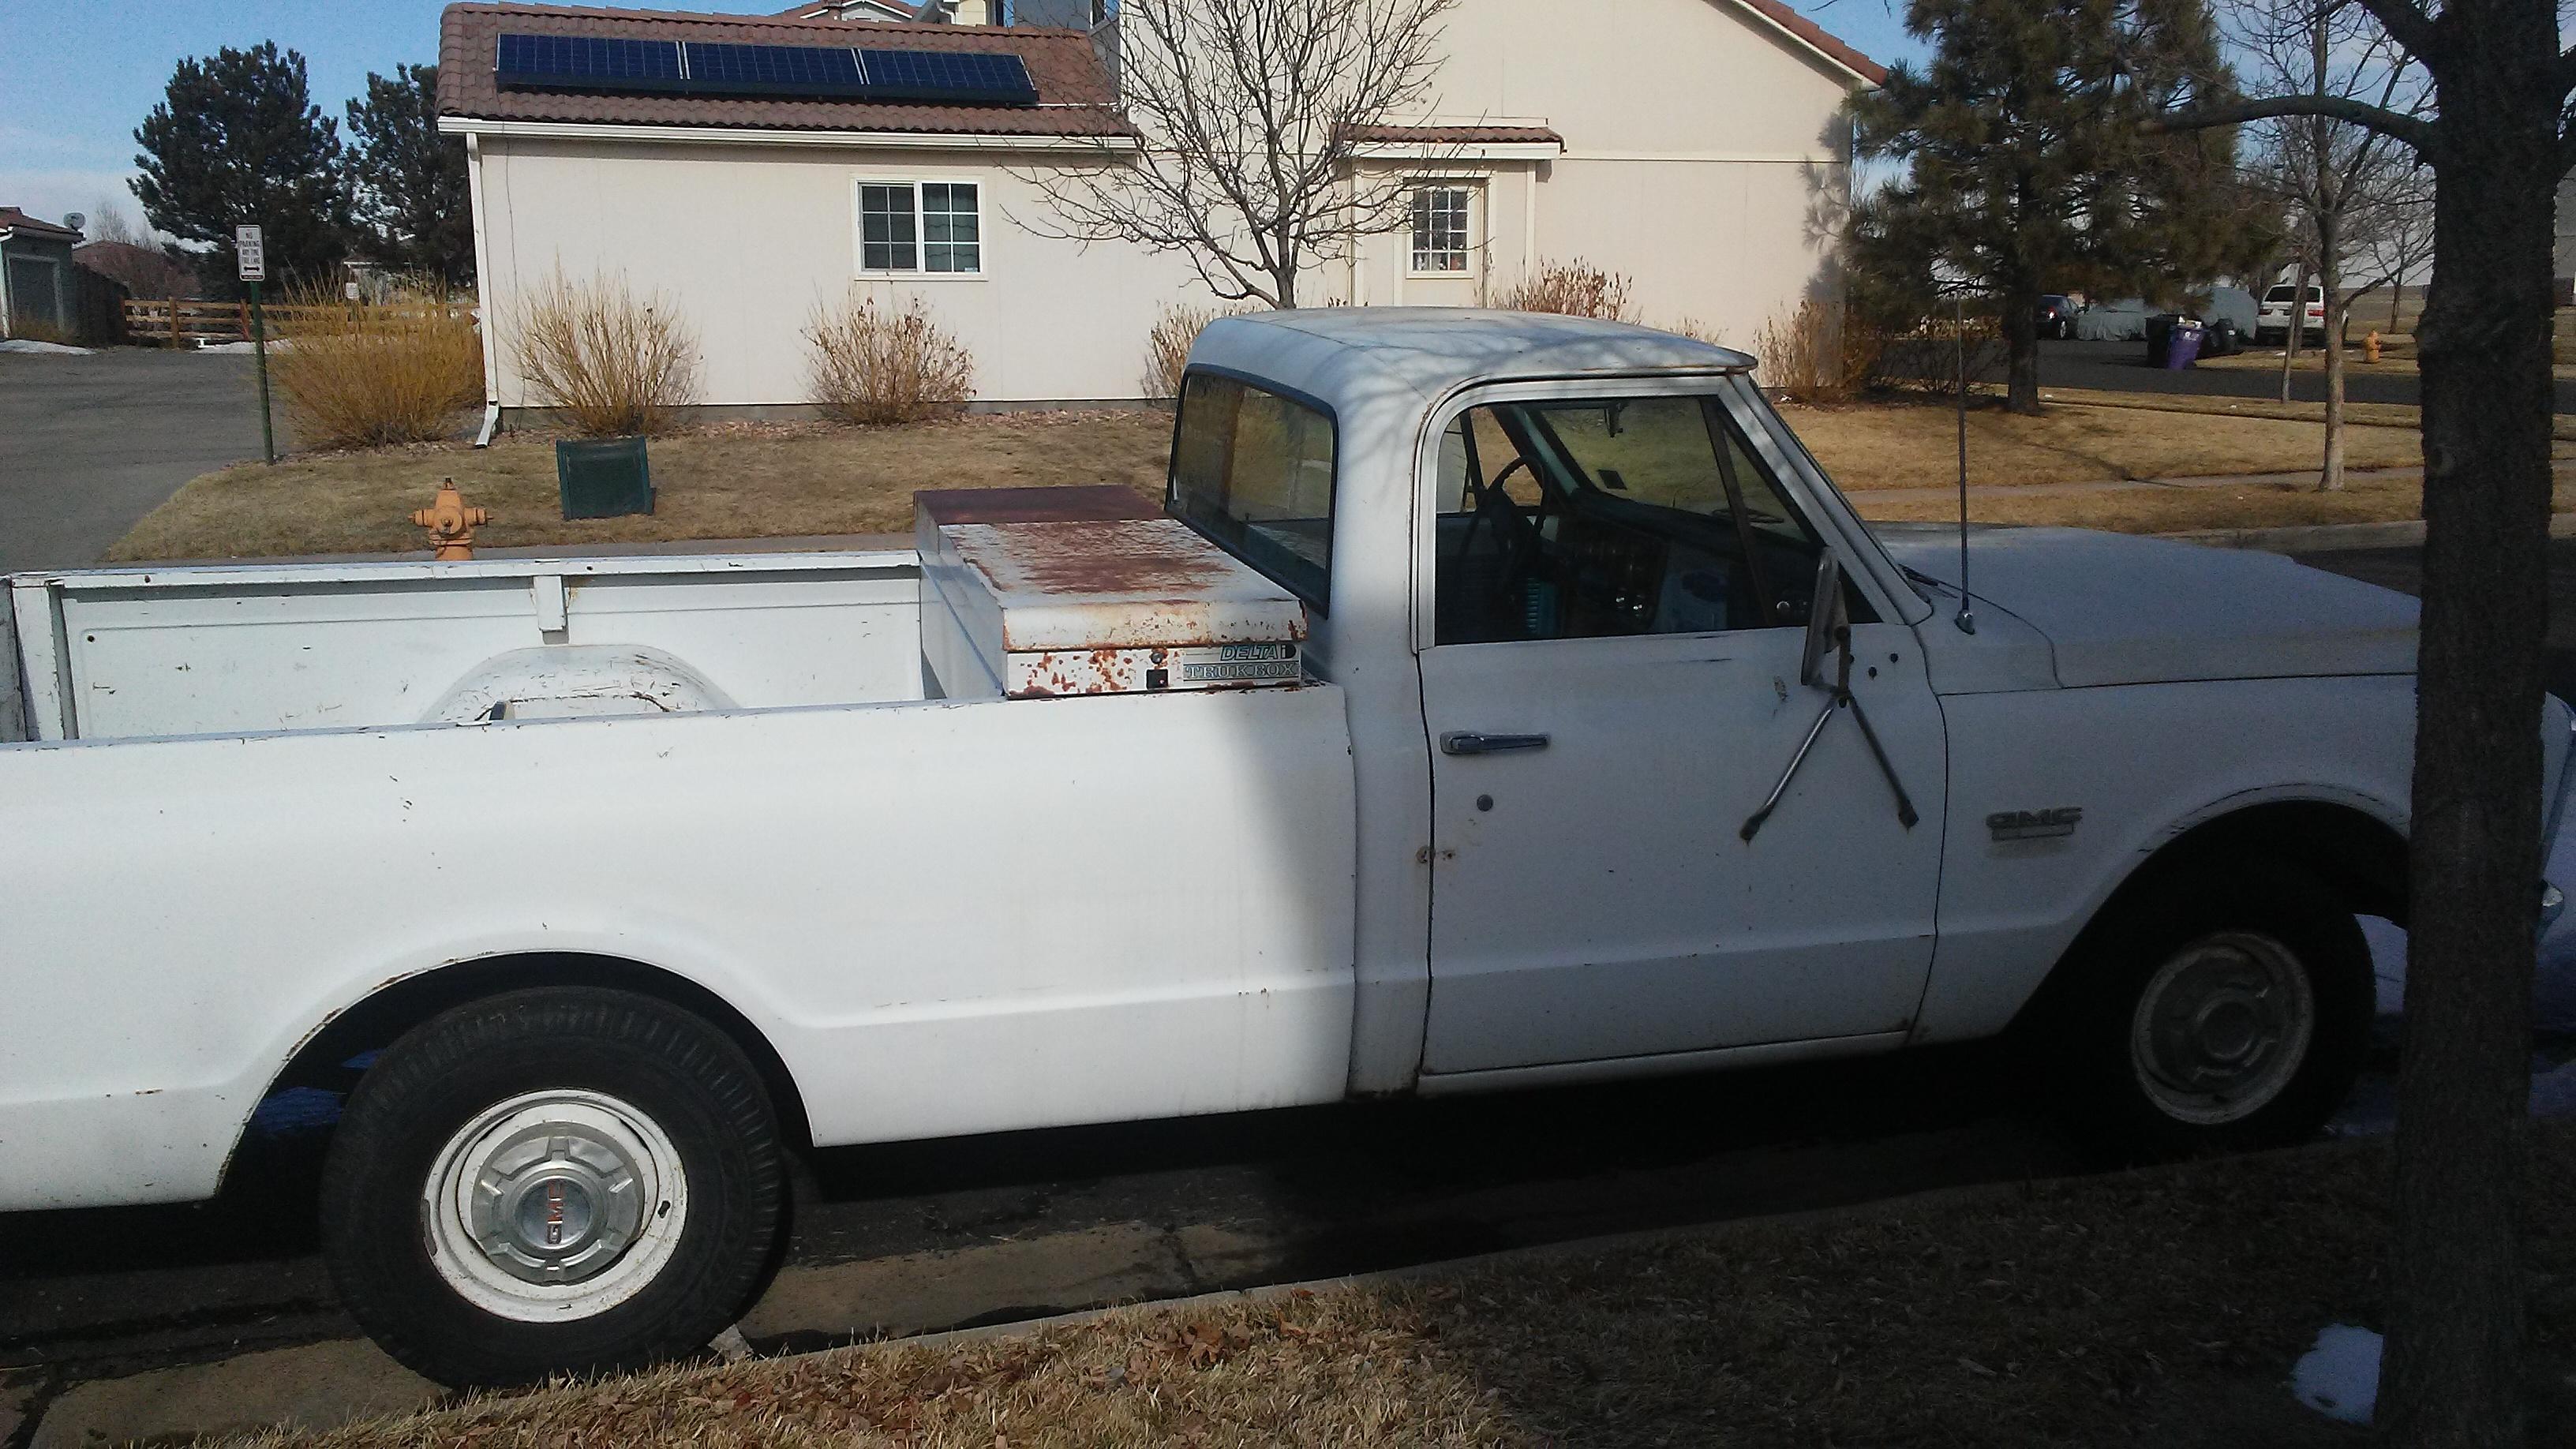 Cash for Cars Huntsville, AL | Sell Your Junk Car | The Clunker Junker